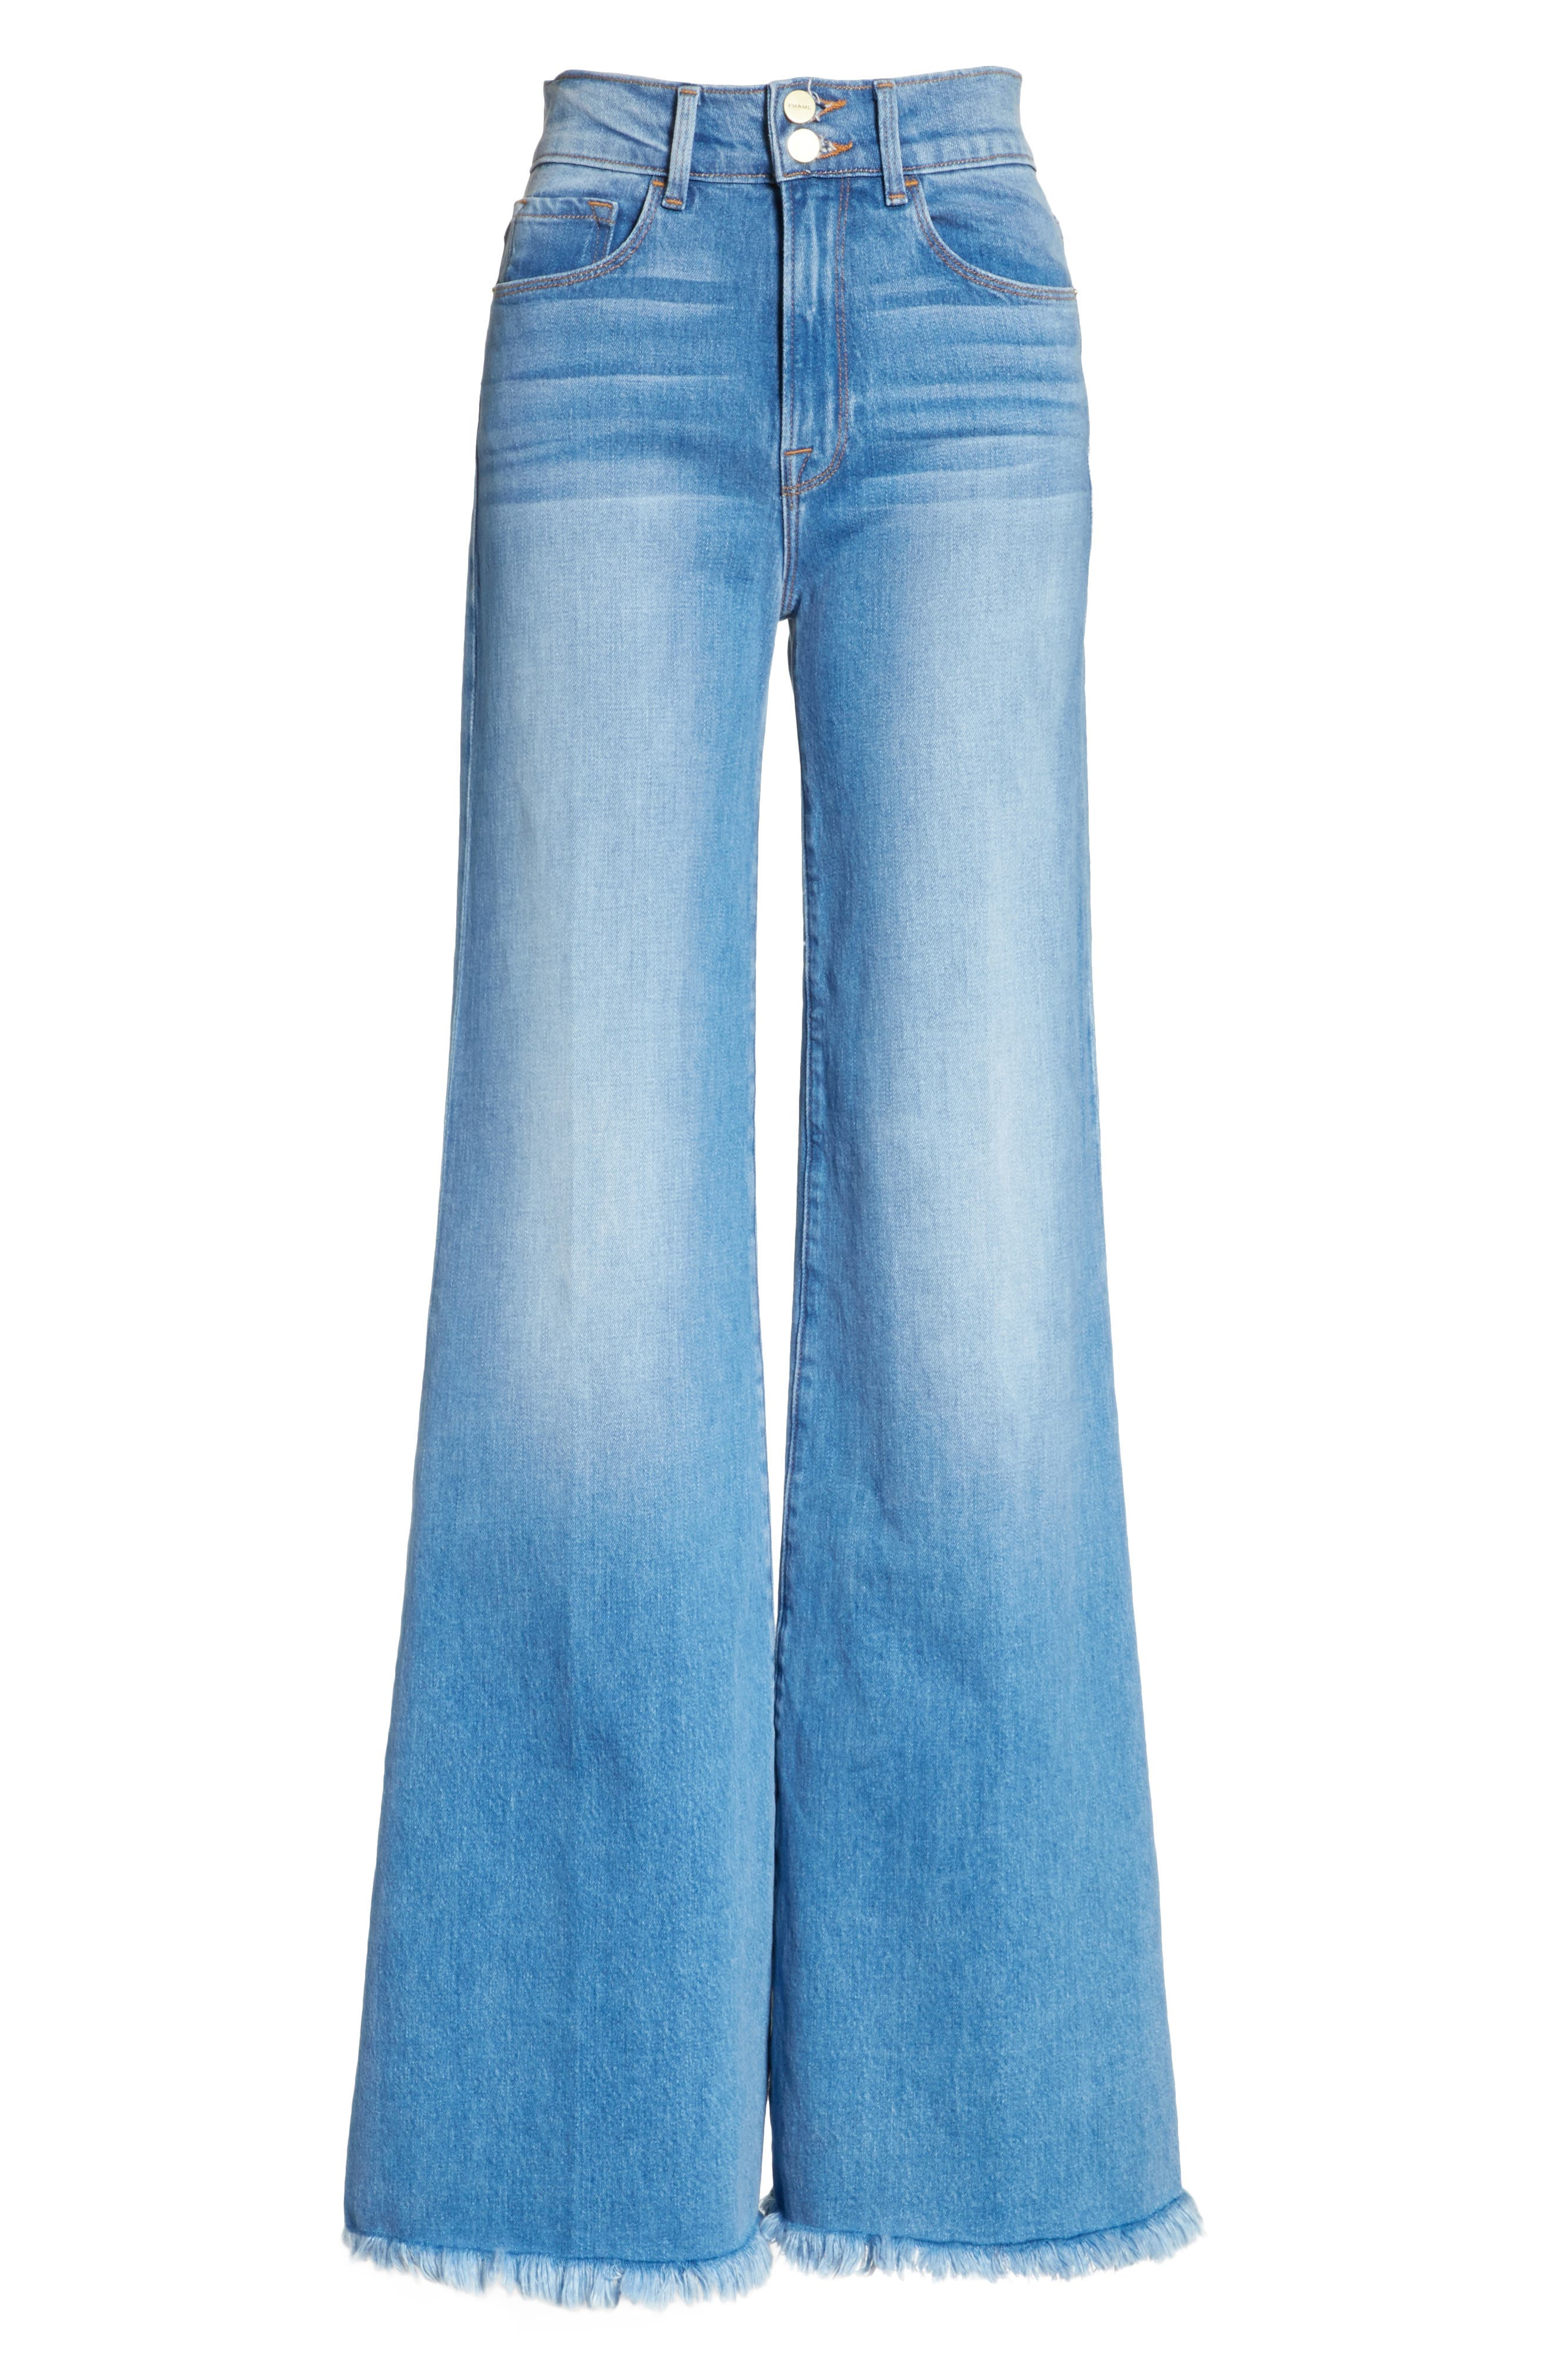 Le Palazzo High Waist Raw Edge Jeans,                             Alternate thumbnail 7, color,                             Opus